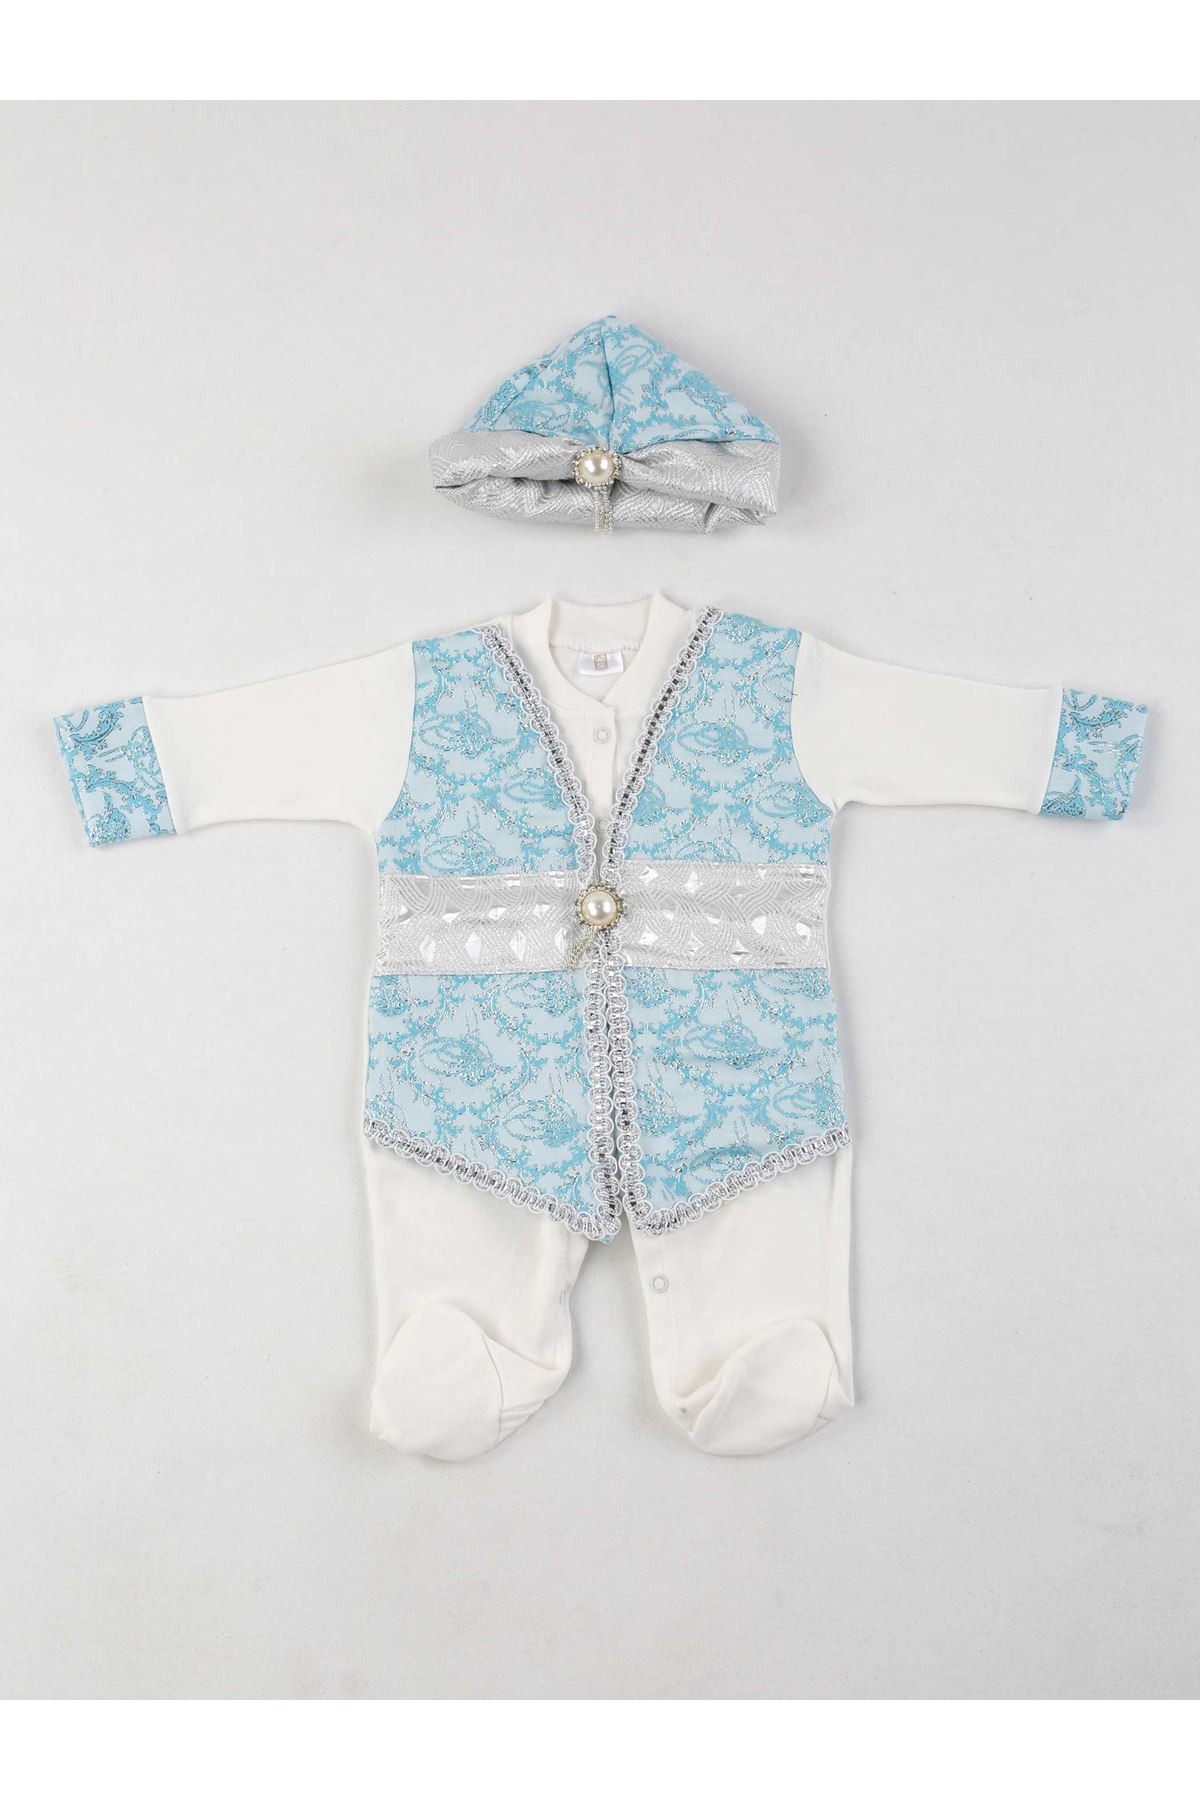 Gray turquoise baby boy suit ottoman mevlüt babies jumpsuit hat mevlüt special occasions cotton sweaty models